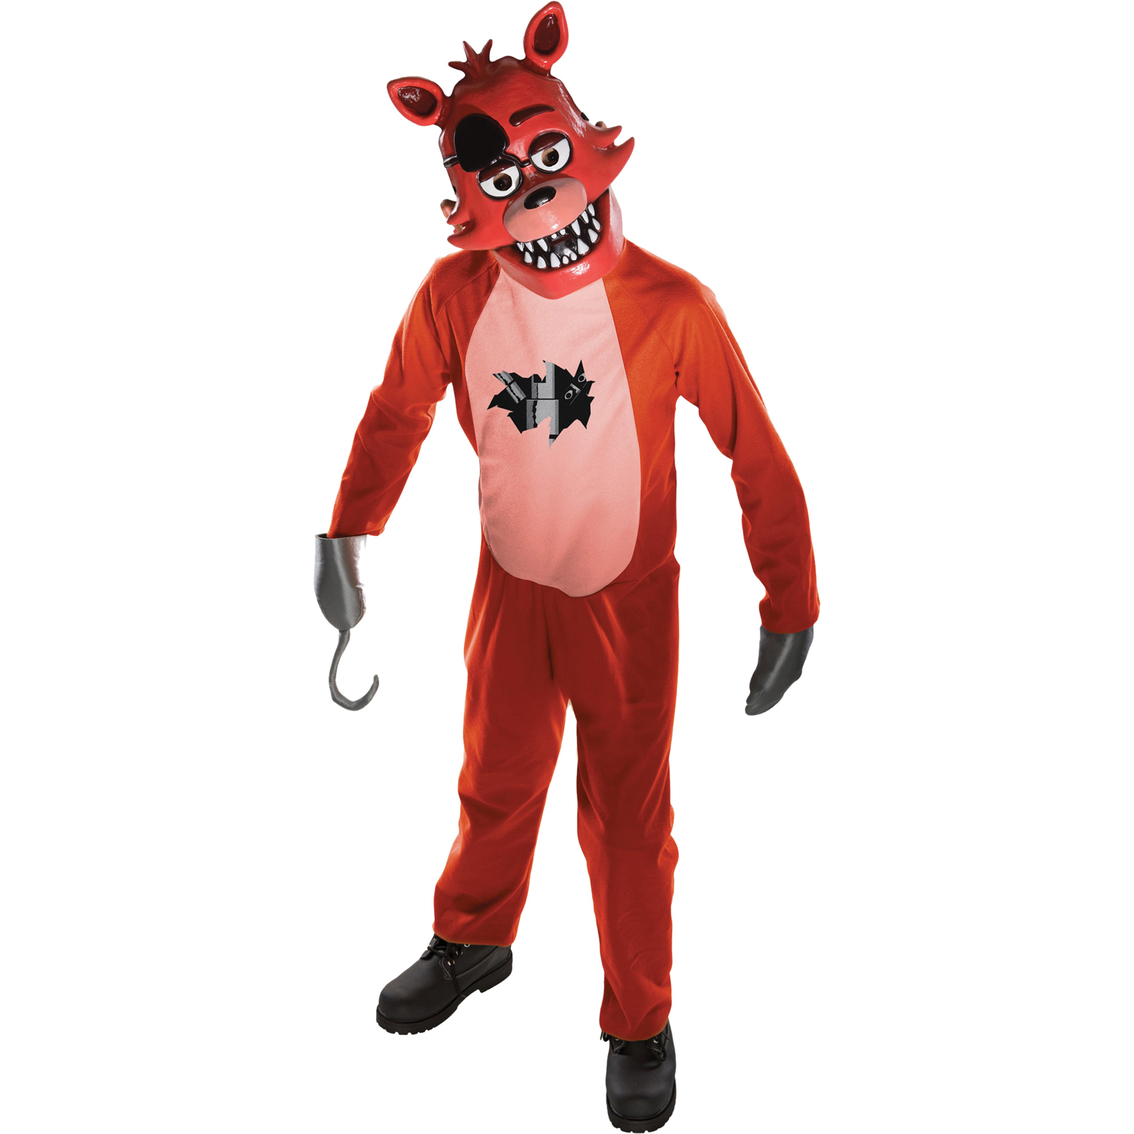 Rubies Costume Kids Five Nights at Freddys Foxy Half Mask